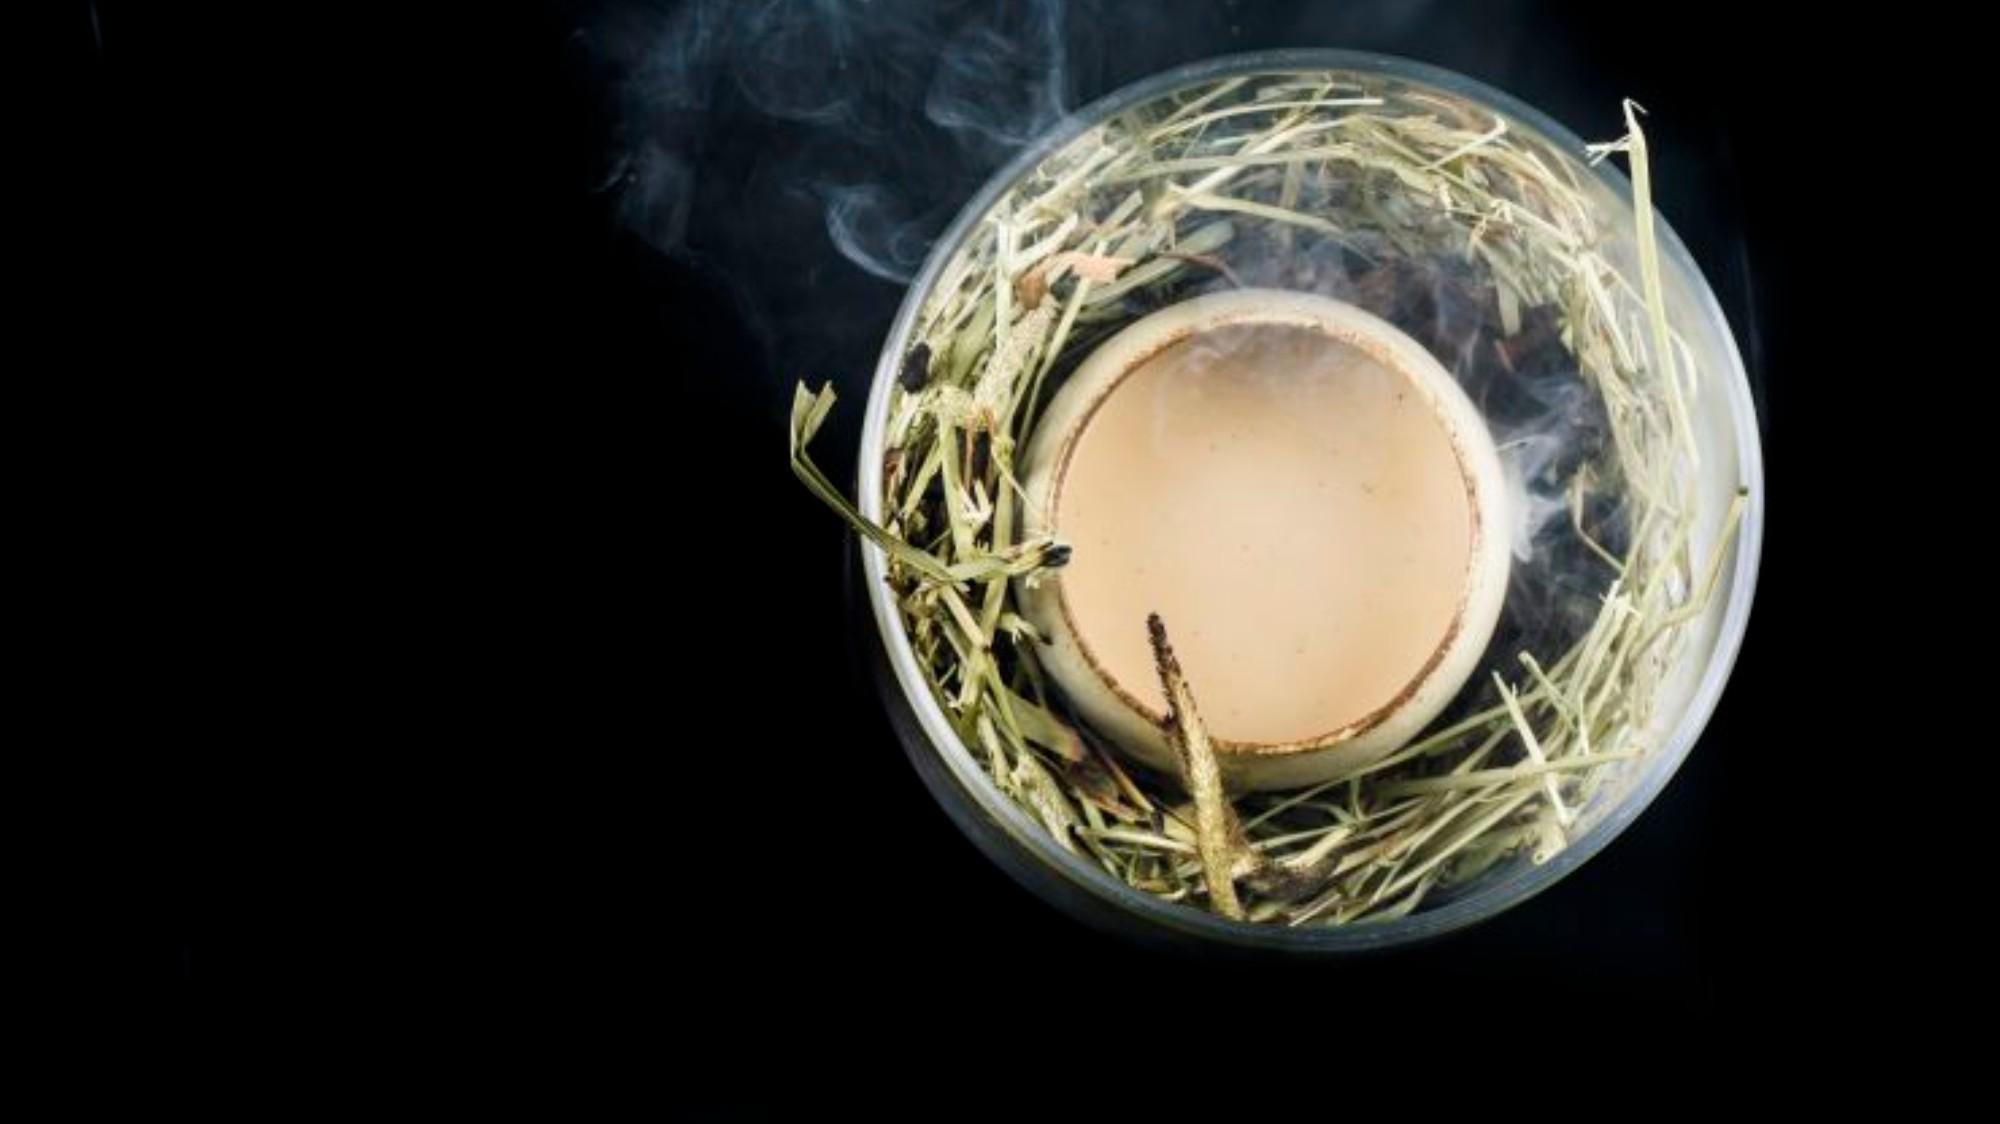 VICE: Singapore's Salted Egg Yolk Addiction -